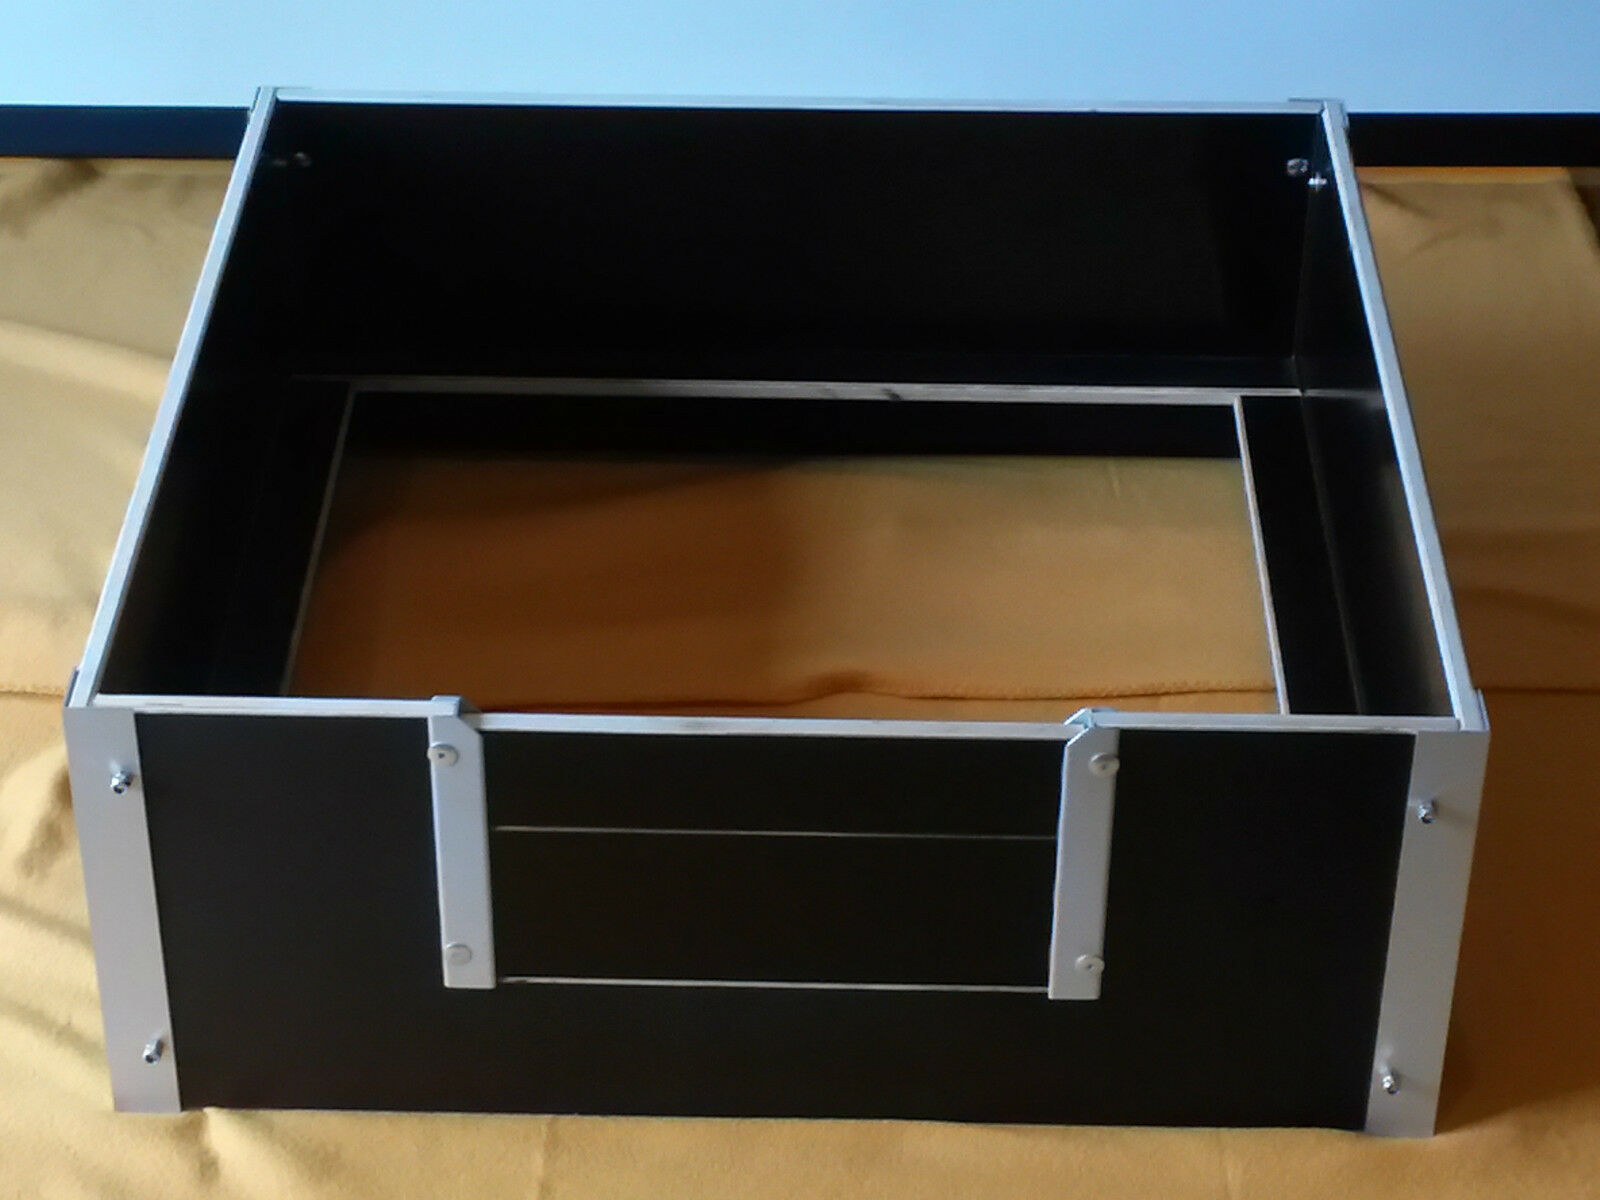 wurfbox welpenbox wurfkiste welpenkiste siebdruck. Black Bedroom Furniture Sets. Home Design Ideas